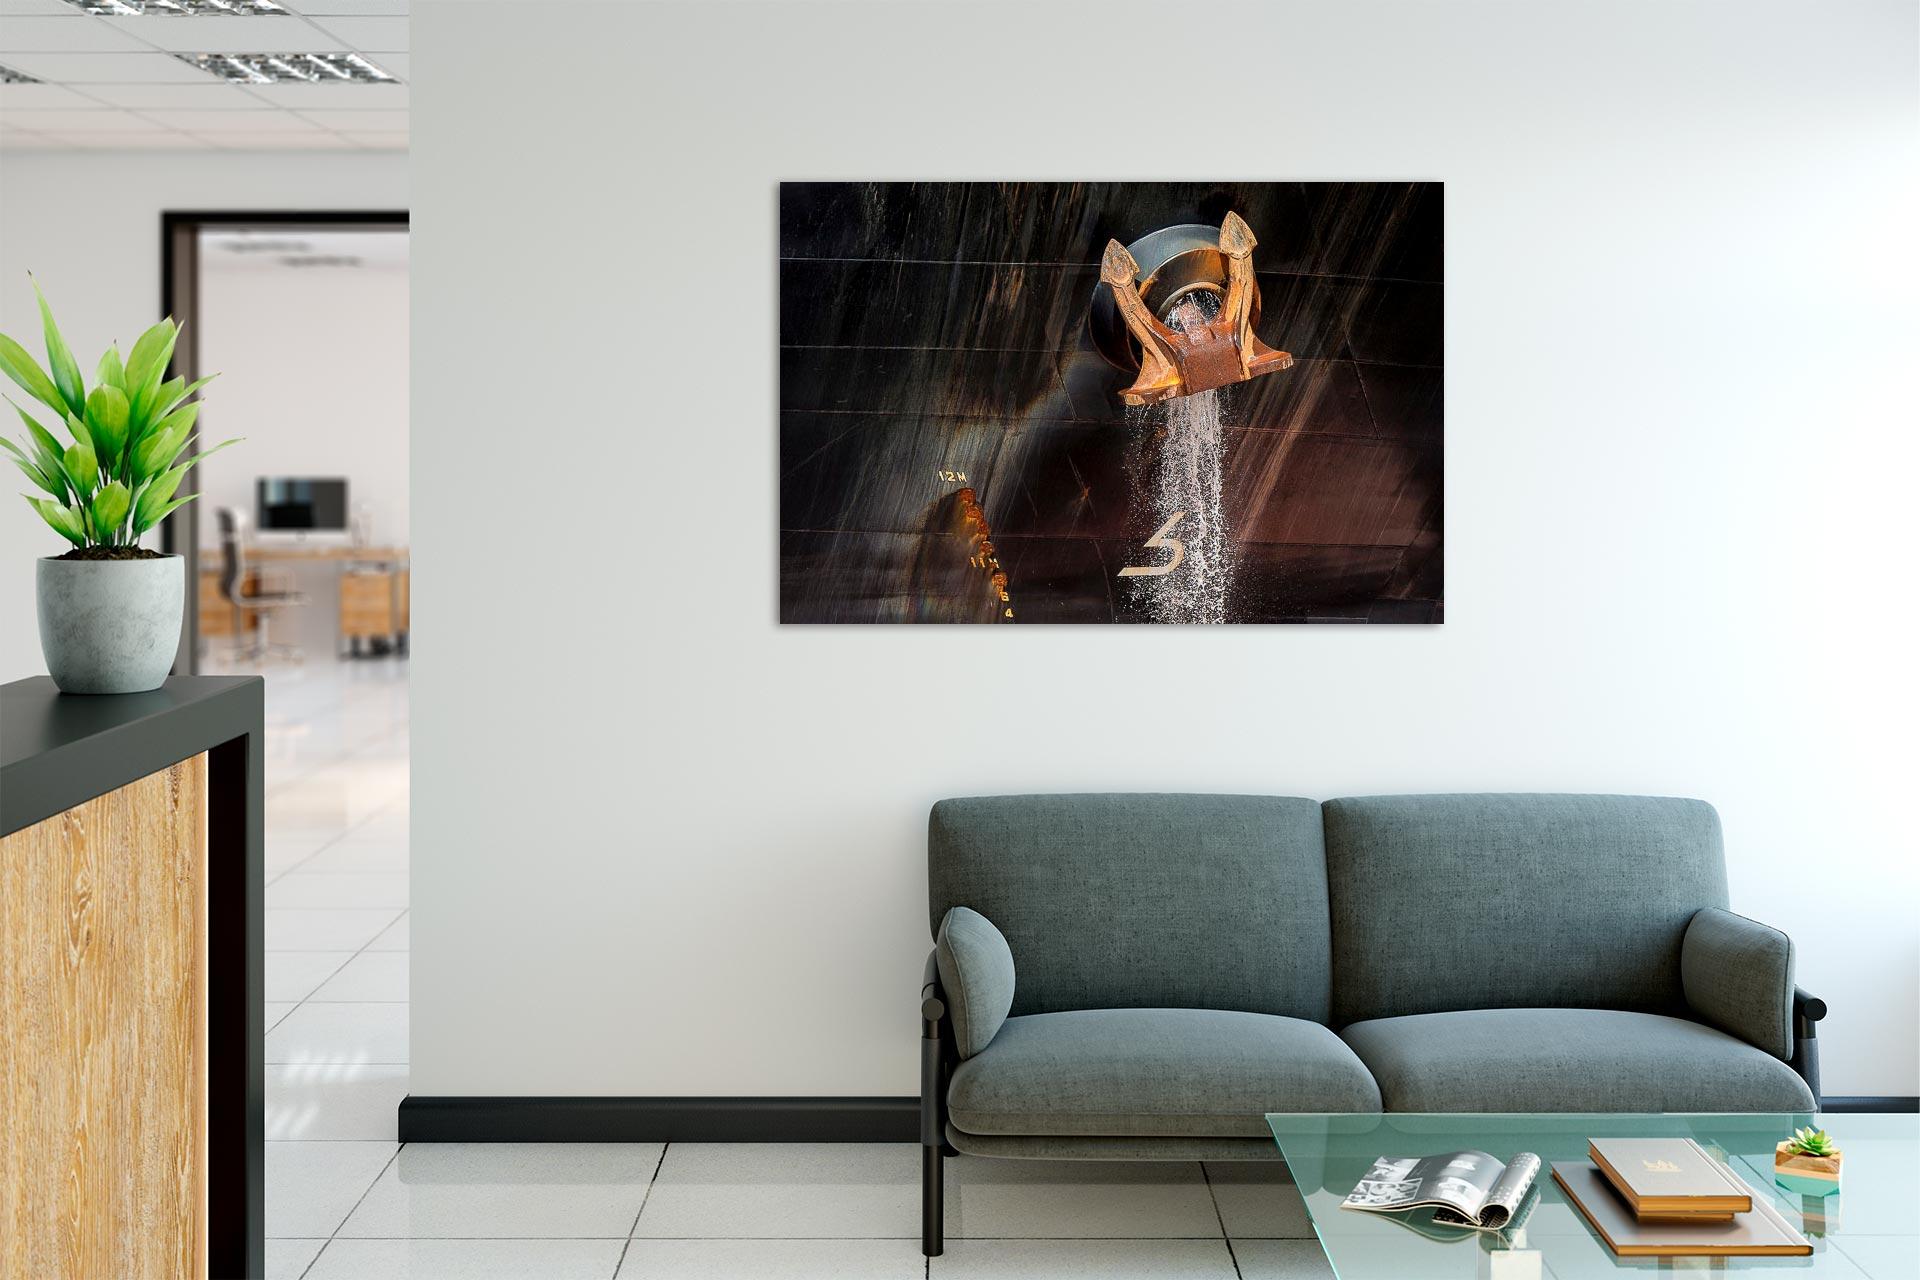 NL055 Anker Hamburg-Wandbild auf Leinwand, Dibond oder hinter Acylglas